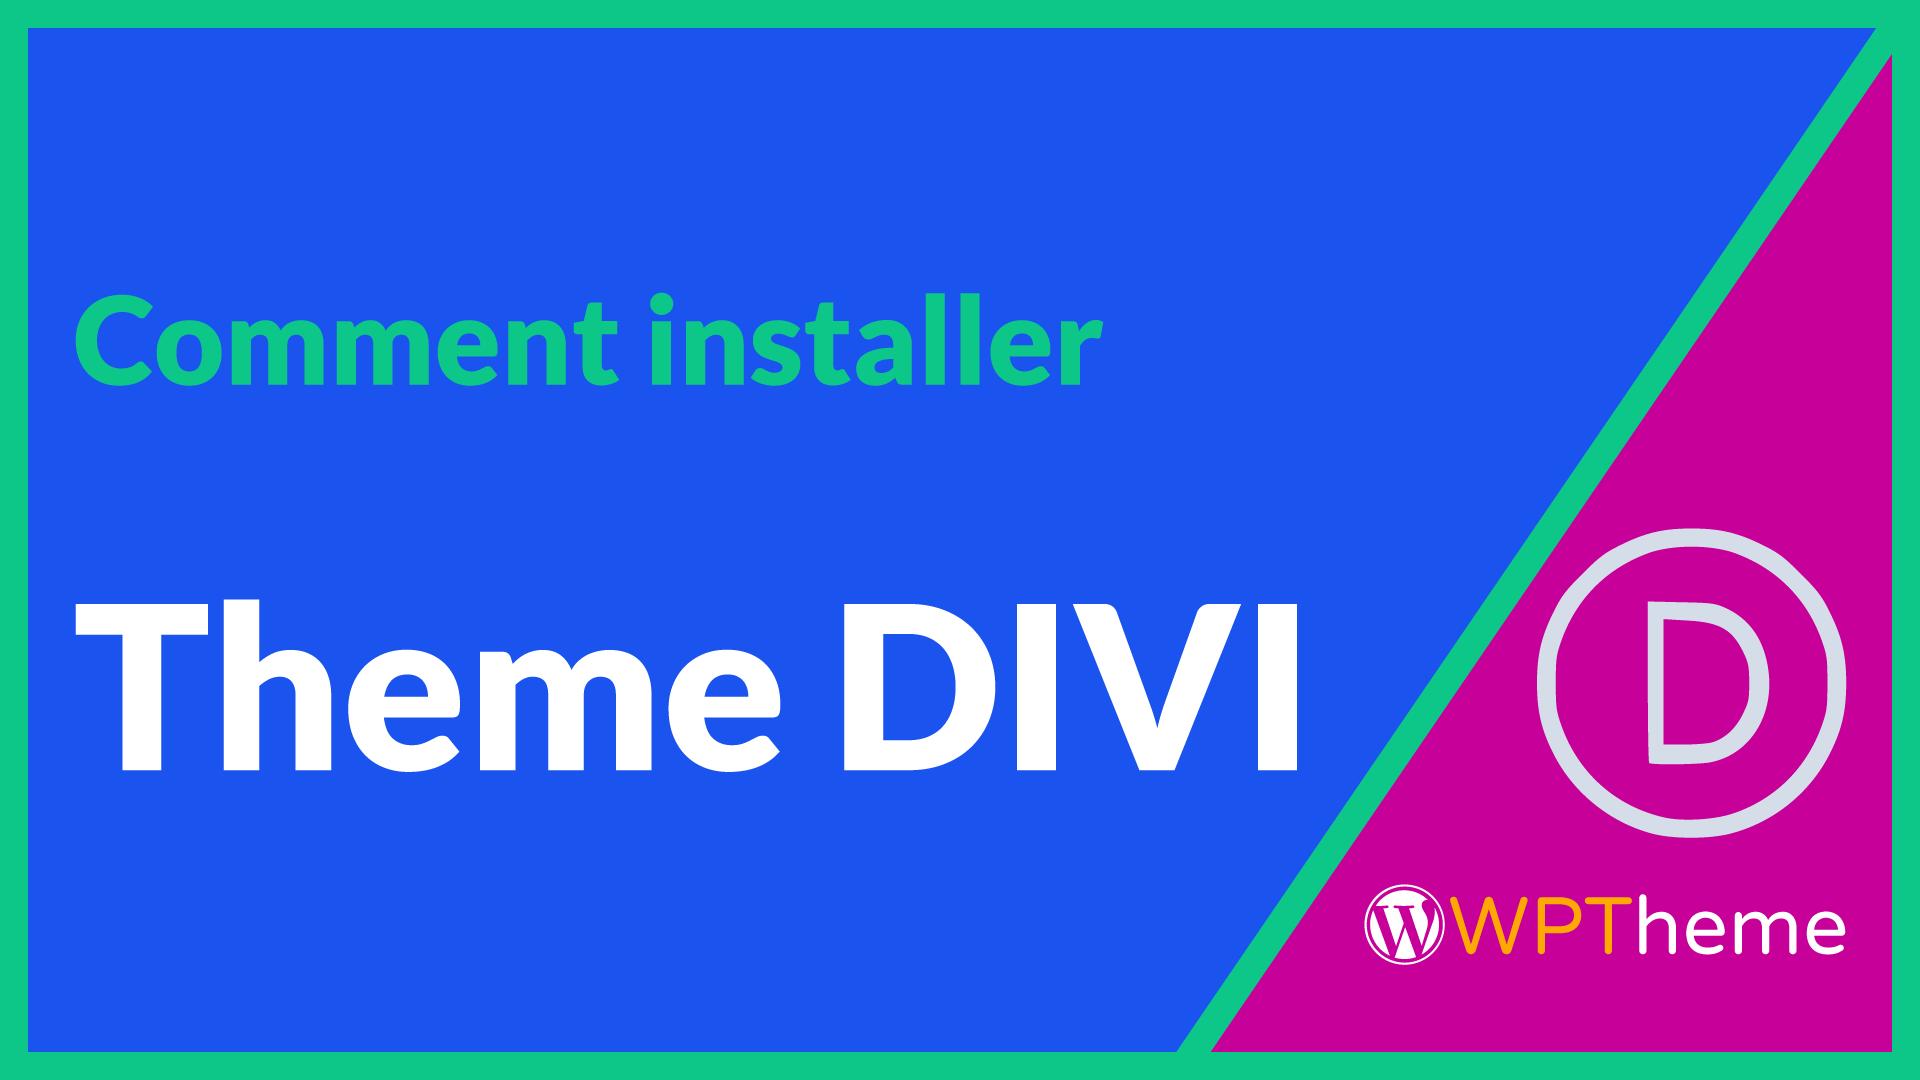 installler-theme-divi